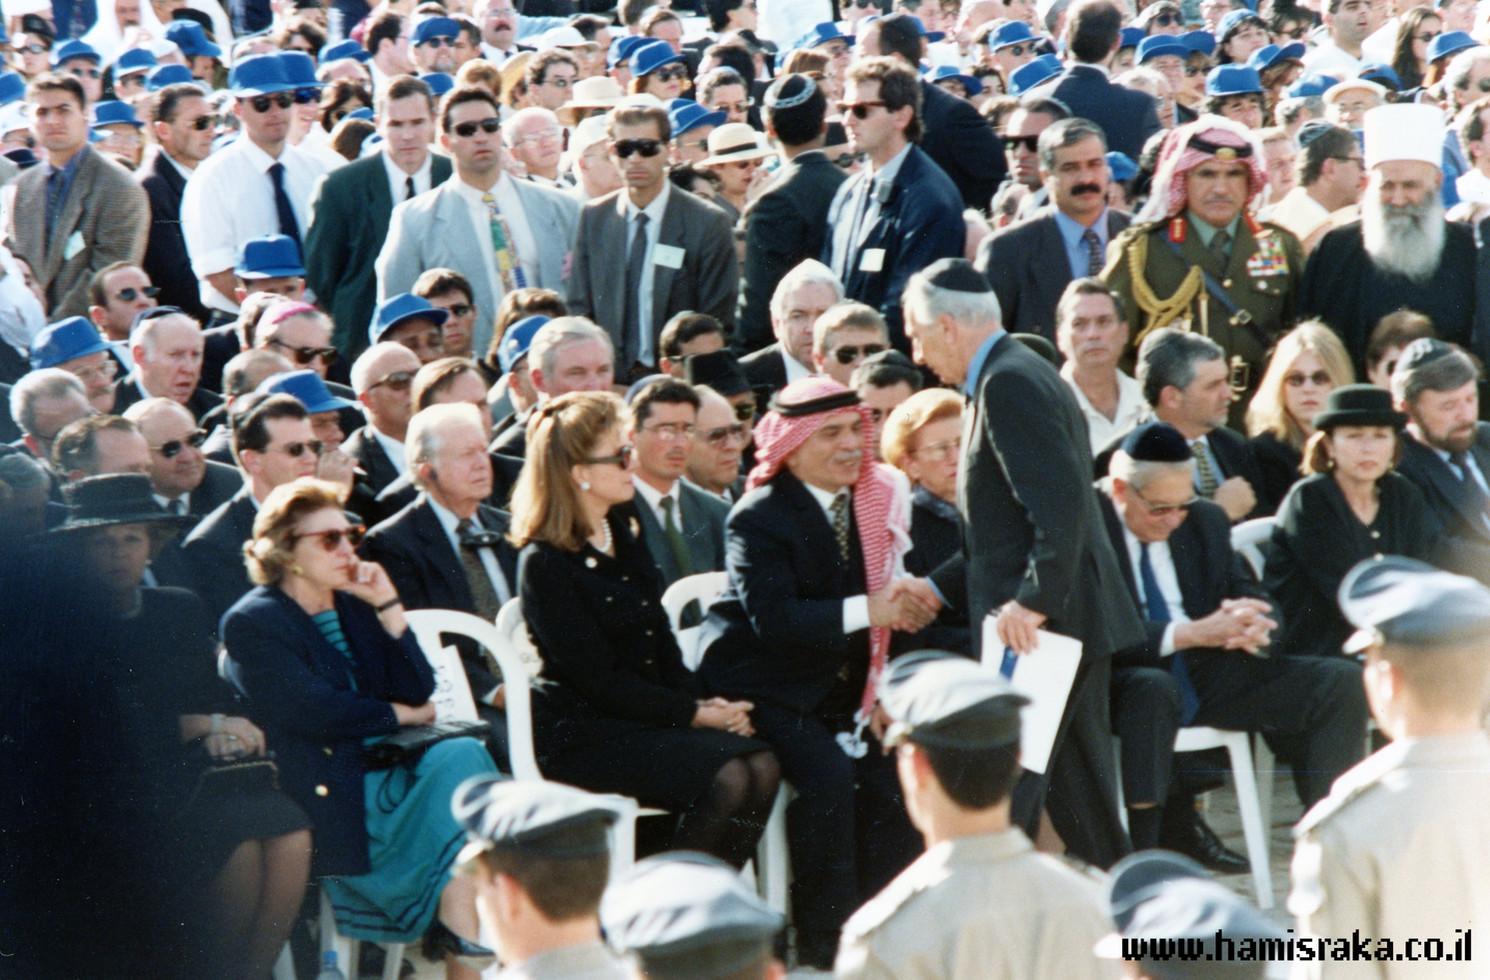 Pnina-Bor-Rabin-Funeral-1.jpg